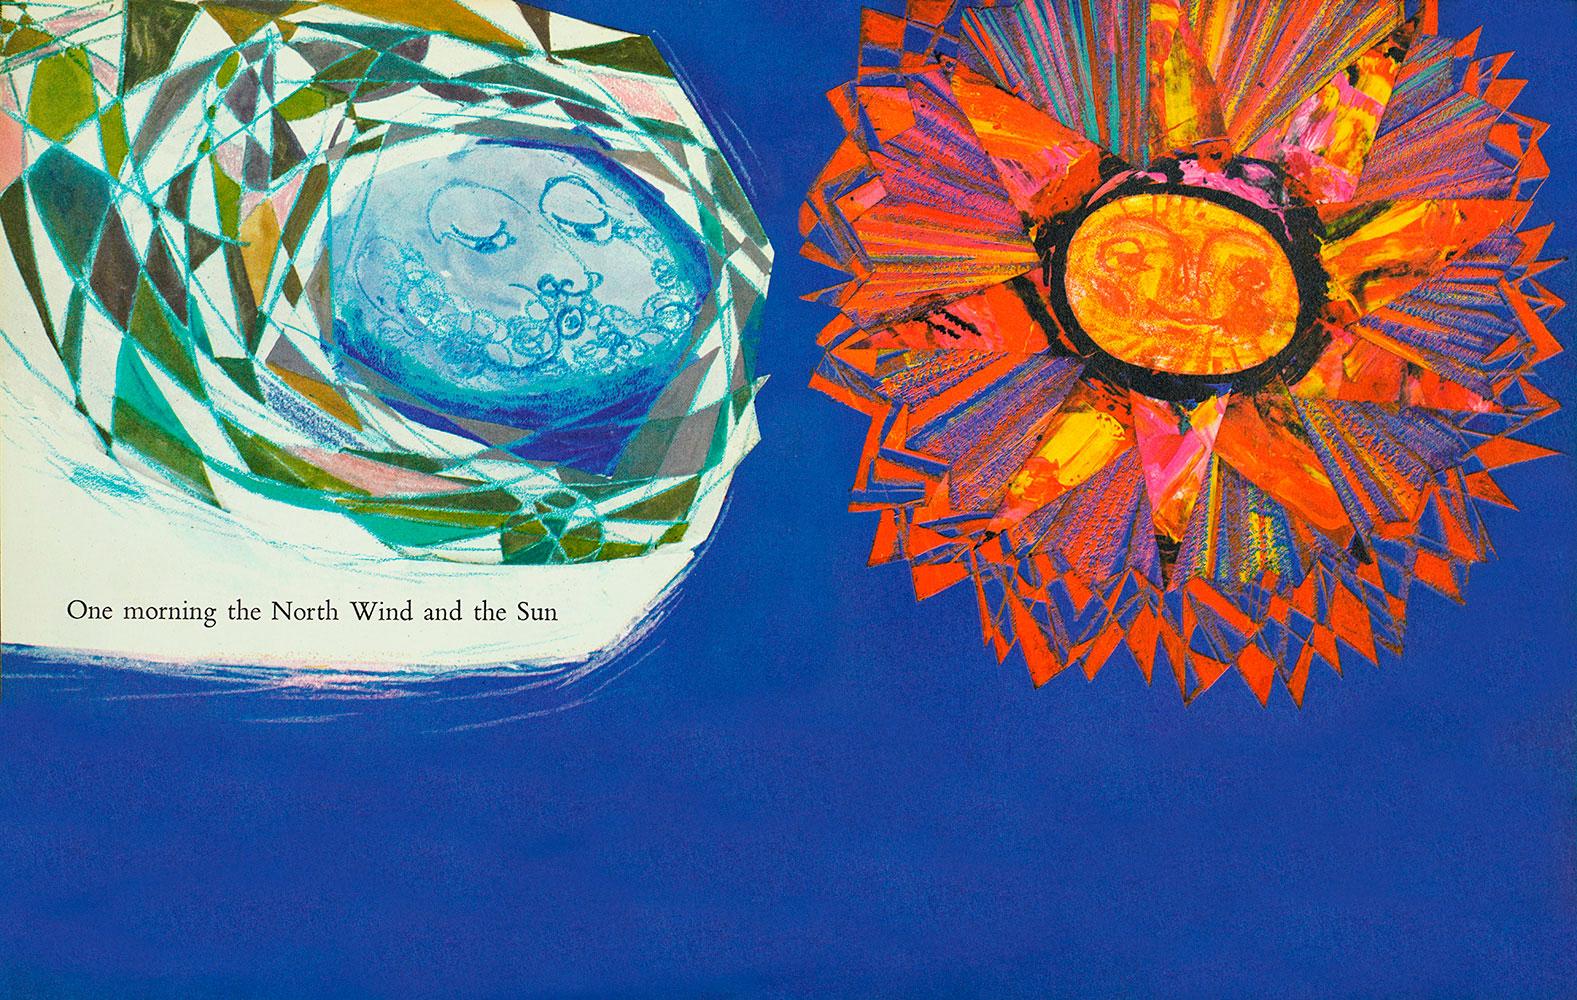 la-fontaine-the-north-wind-and-the-sun-book-page-1-&-2-brian-wildsmith.jpg